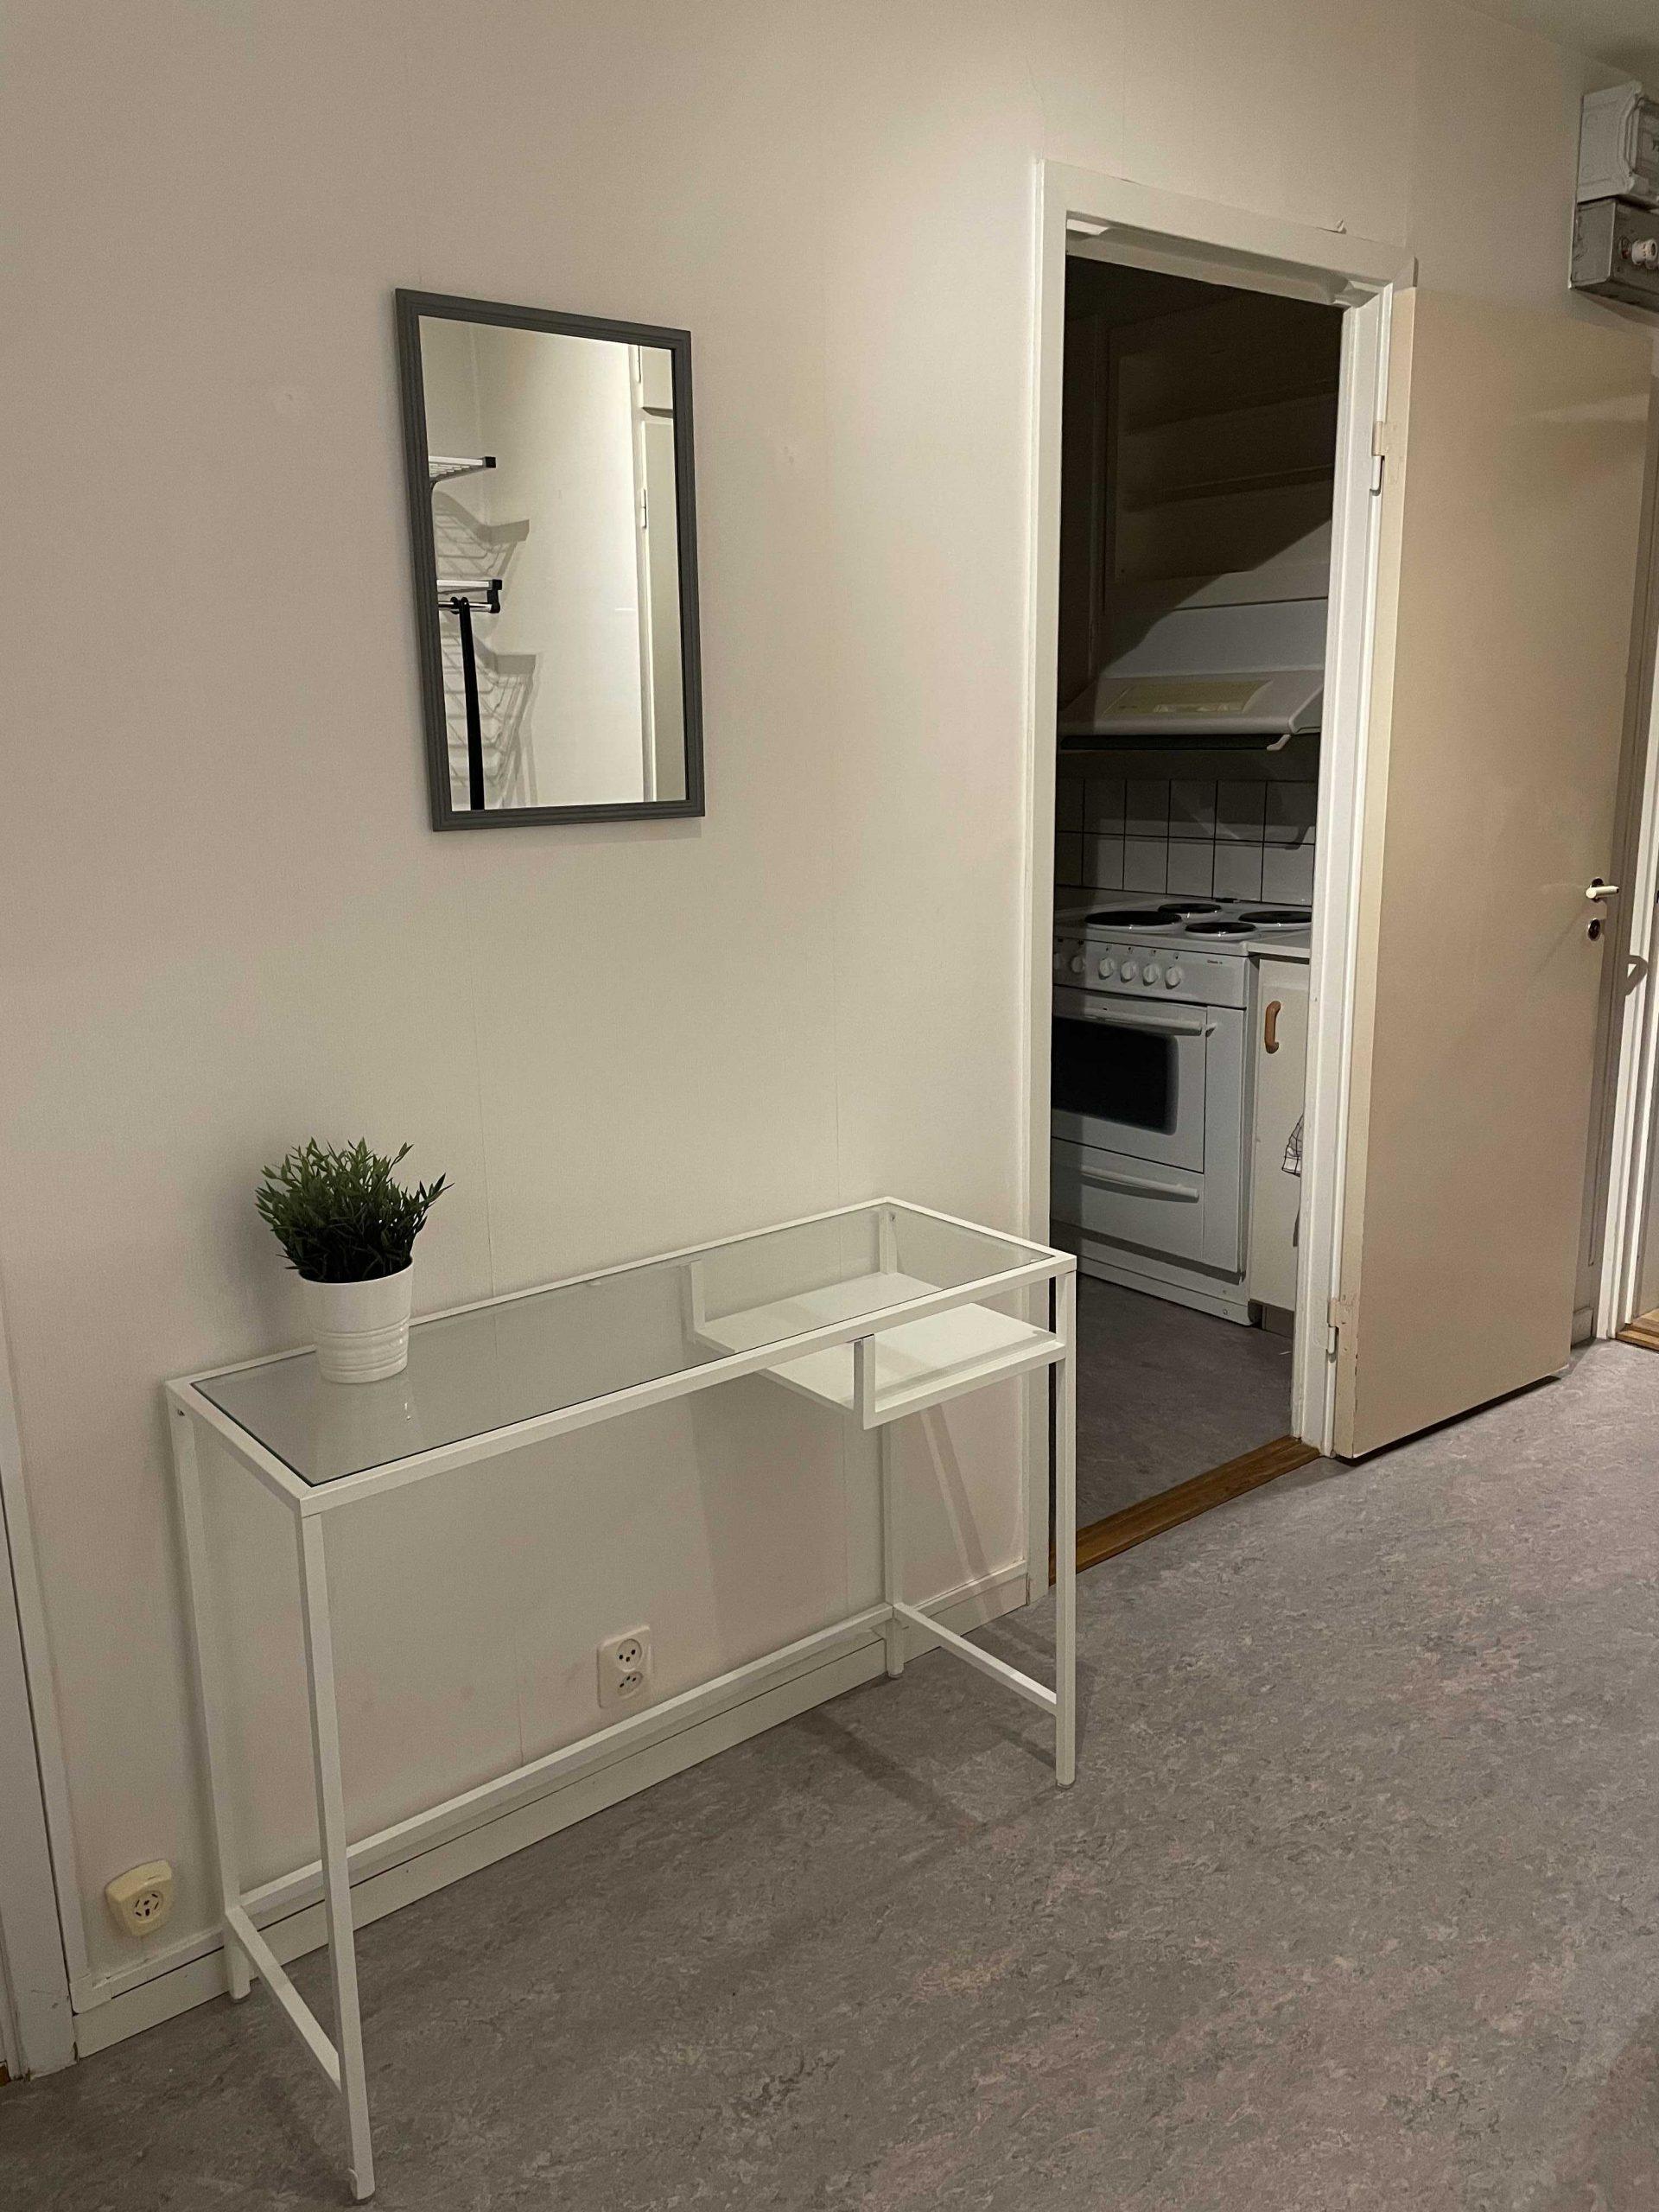 Stayeasy, Longstay, business accommodation